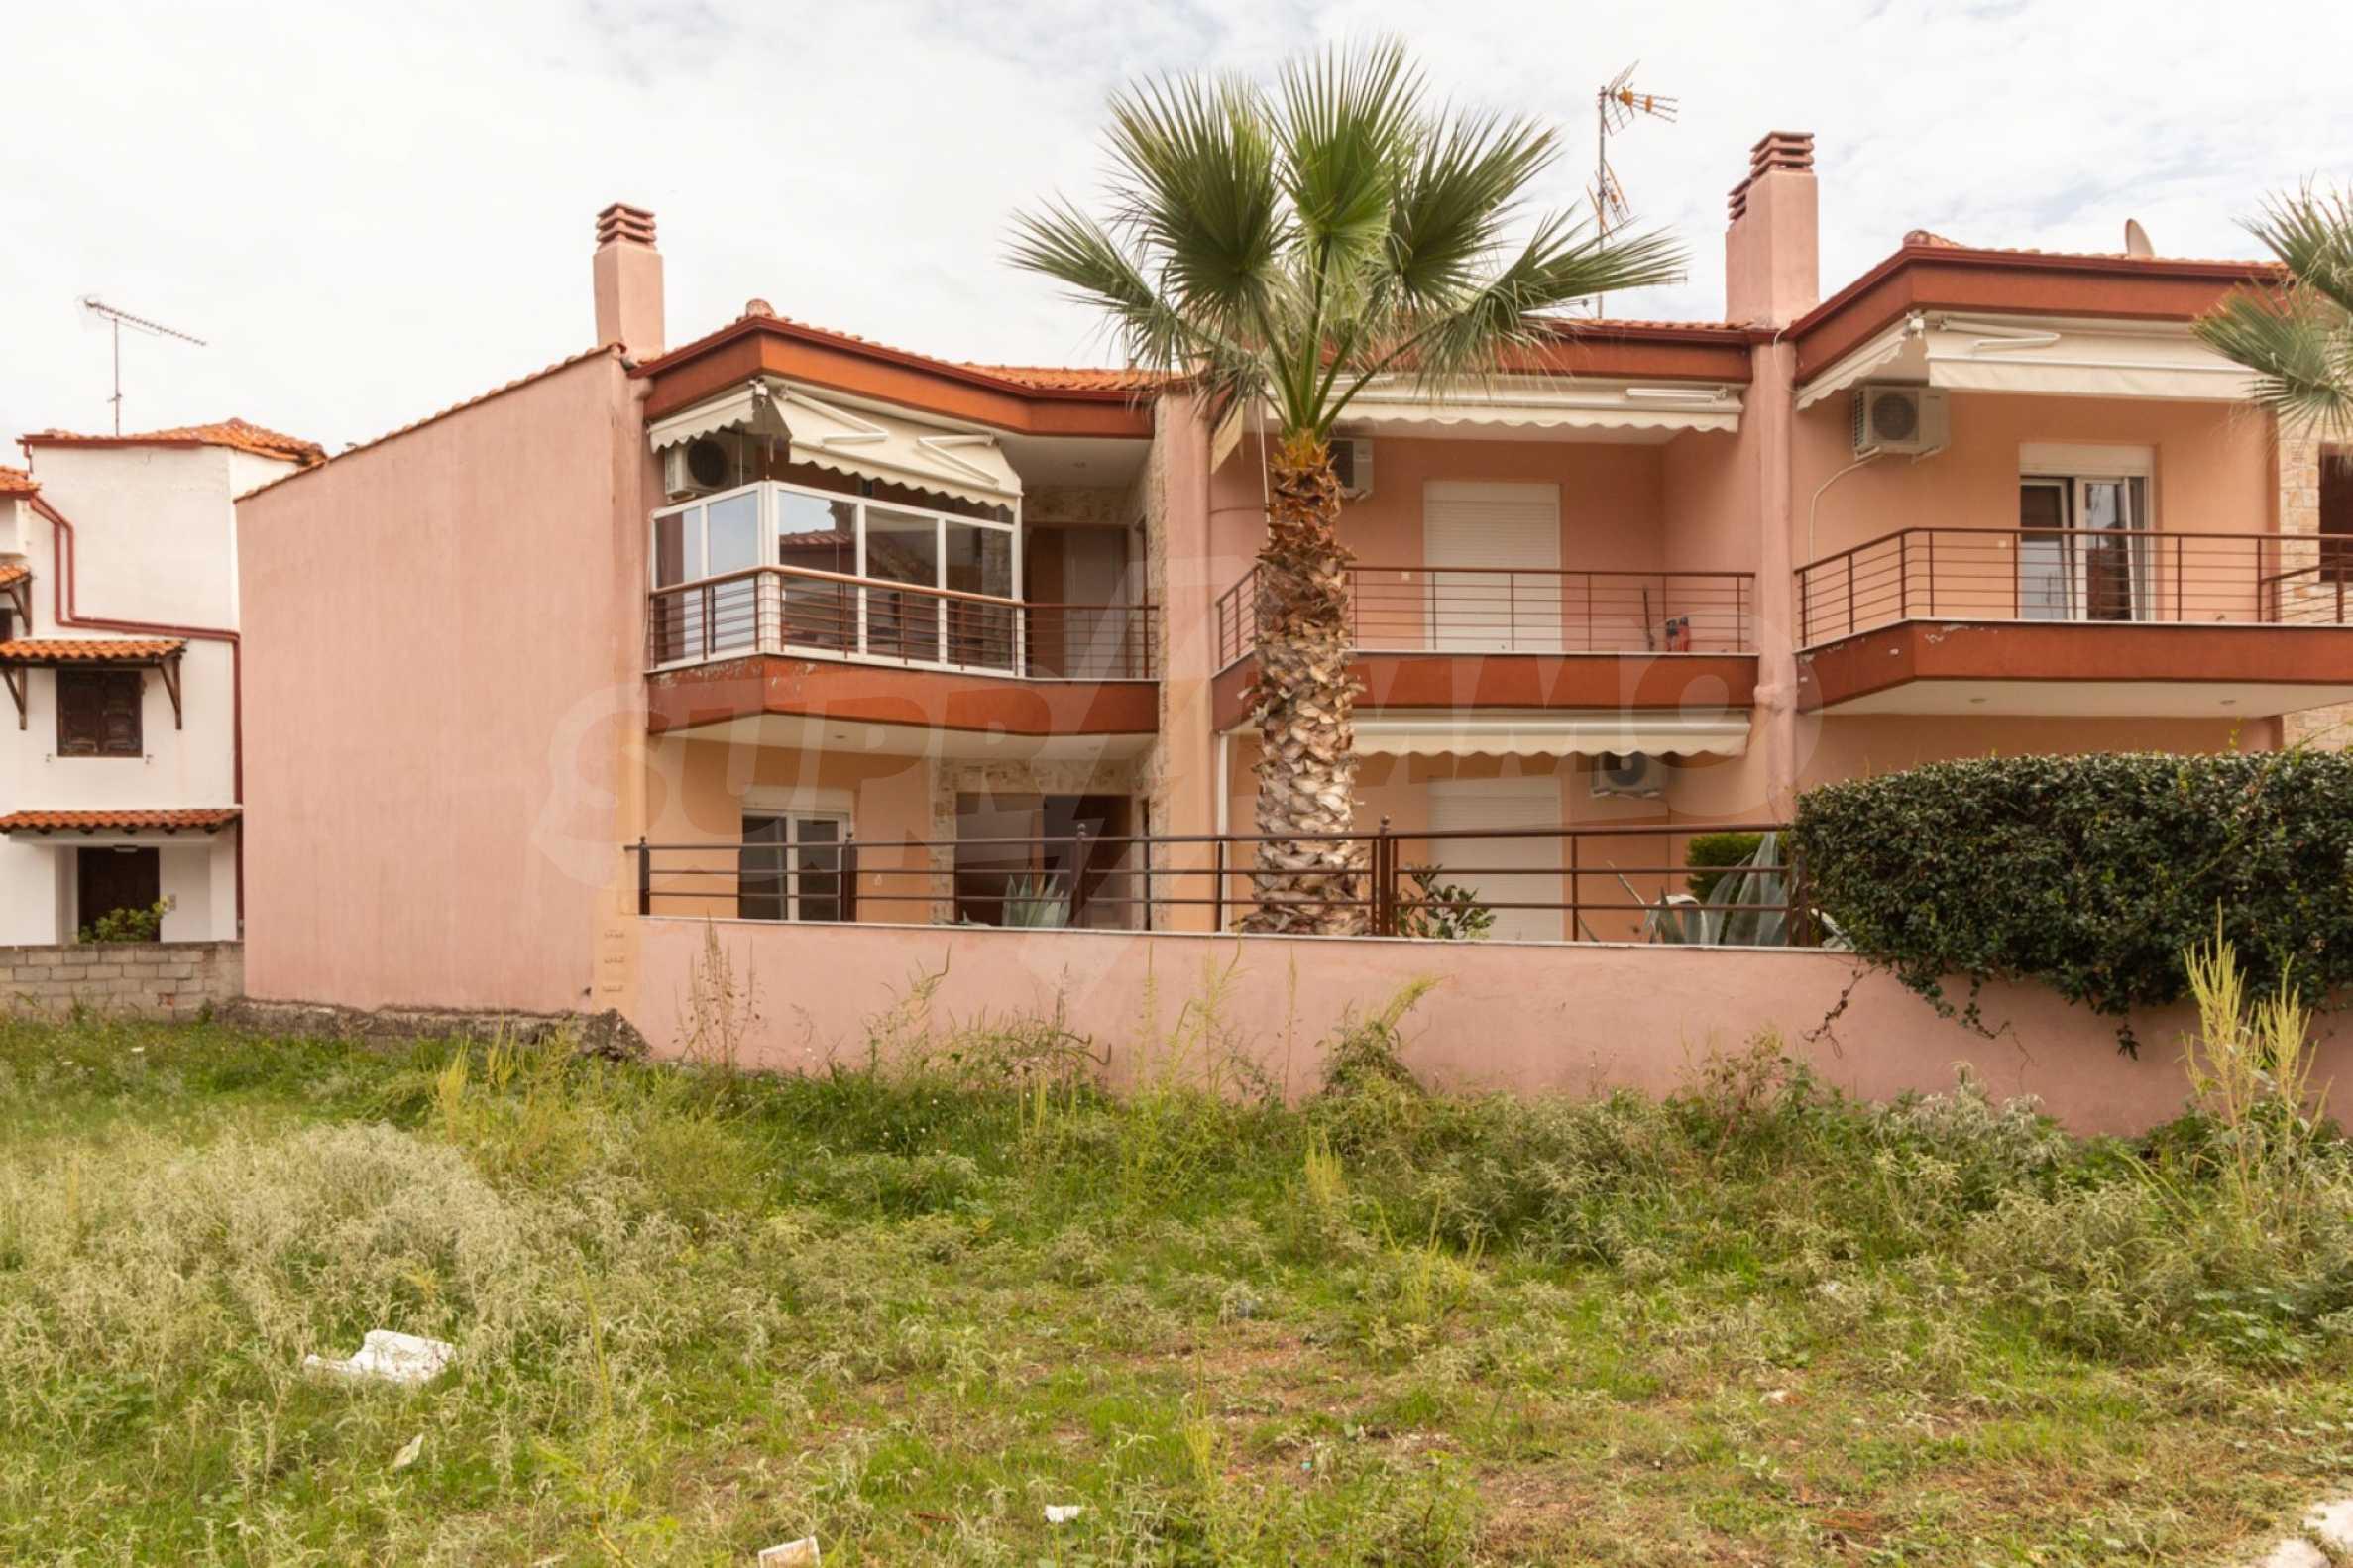 тристаен апартамент в Потидея, Касандра 10